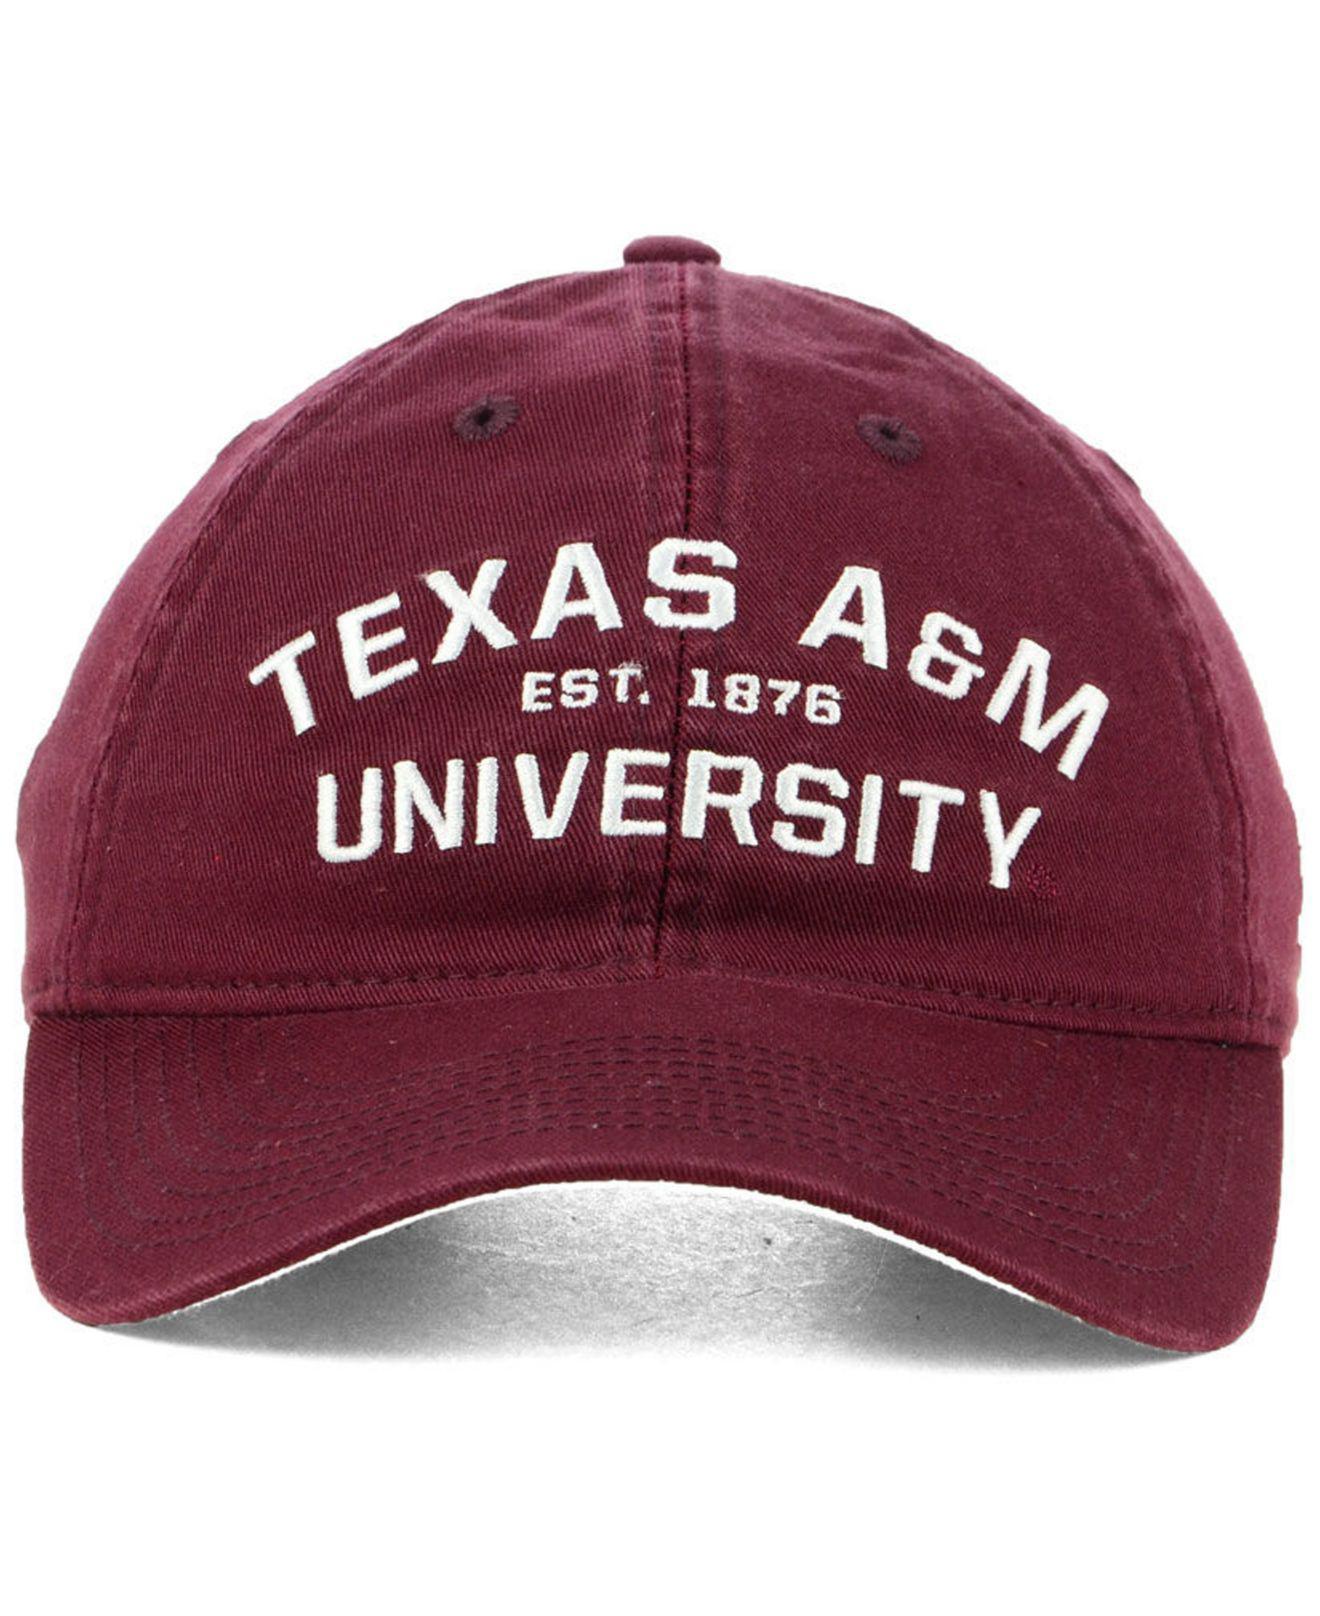 37046ae772a Lyst - Adidas Texas A m Aggies Stadium Performance Wordmark Adjustable  Strapback Cap in Red for Men